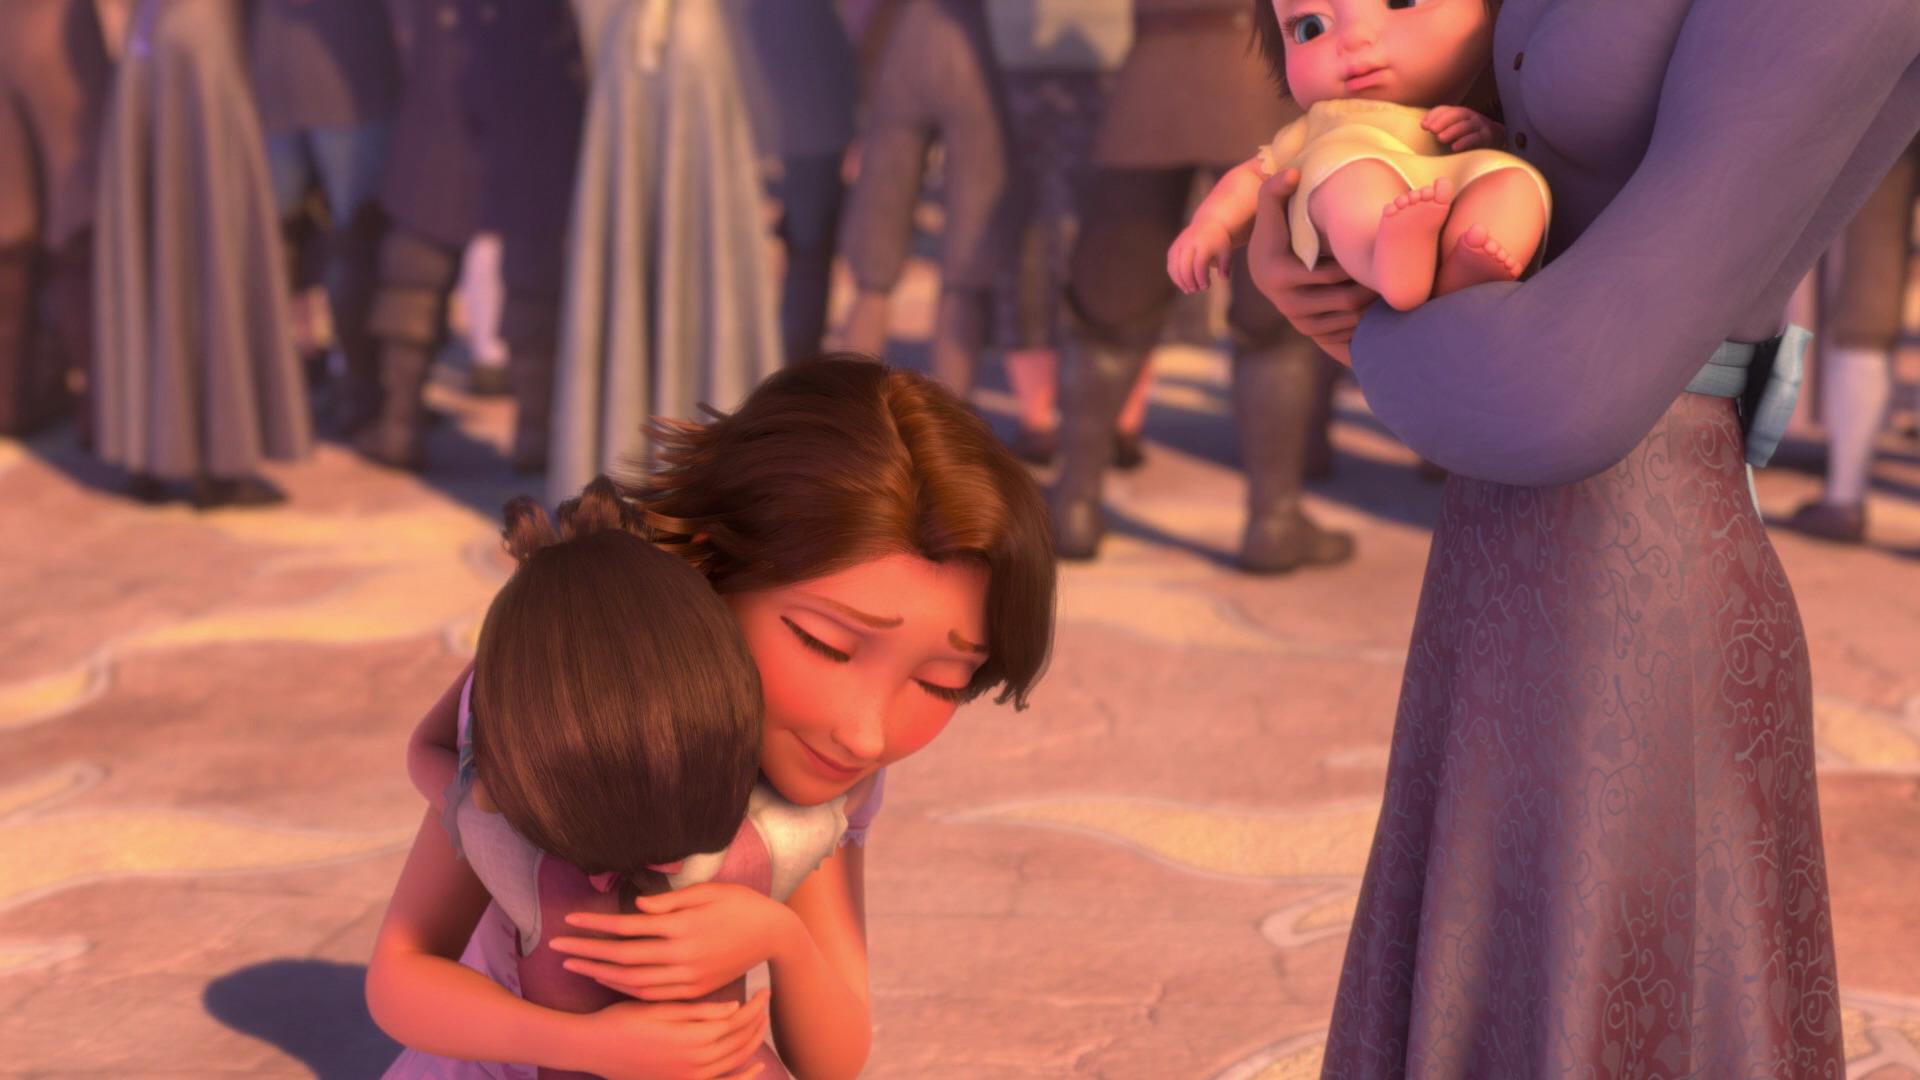 Princess Rapunzel Ending Rapunzel Of Disney S Tangled च त र 35423064 फ न प प